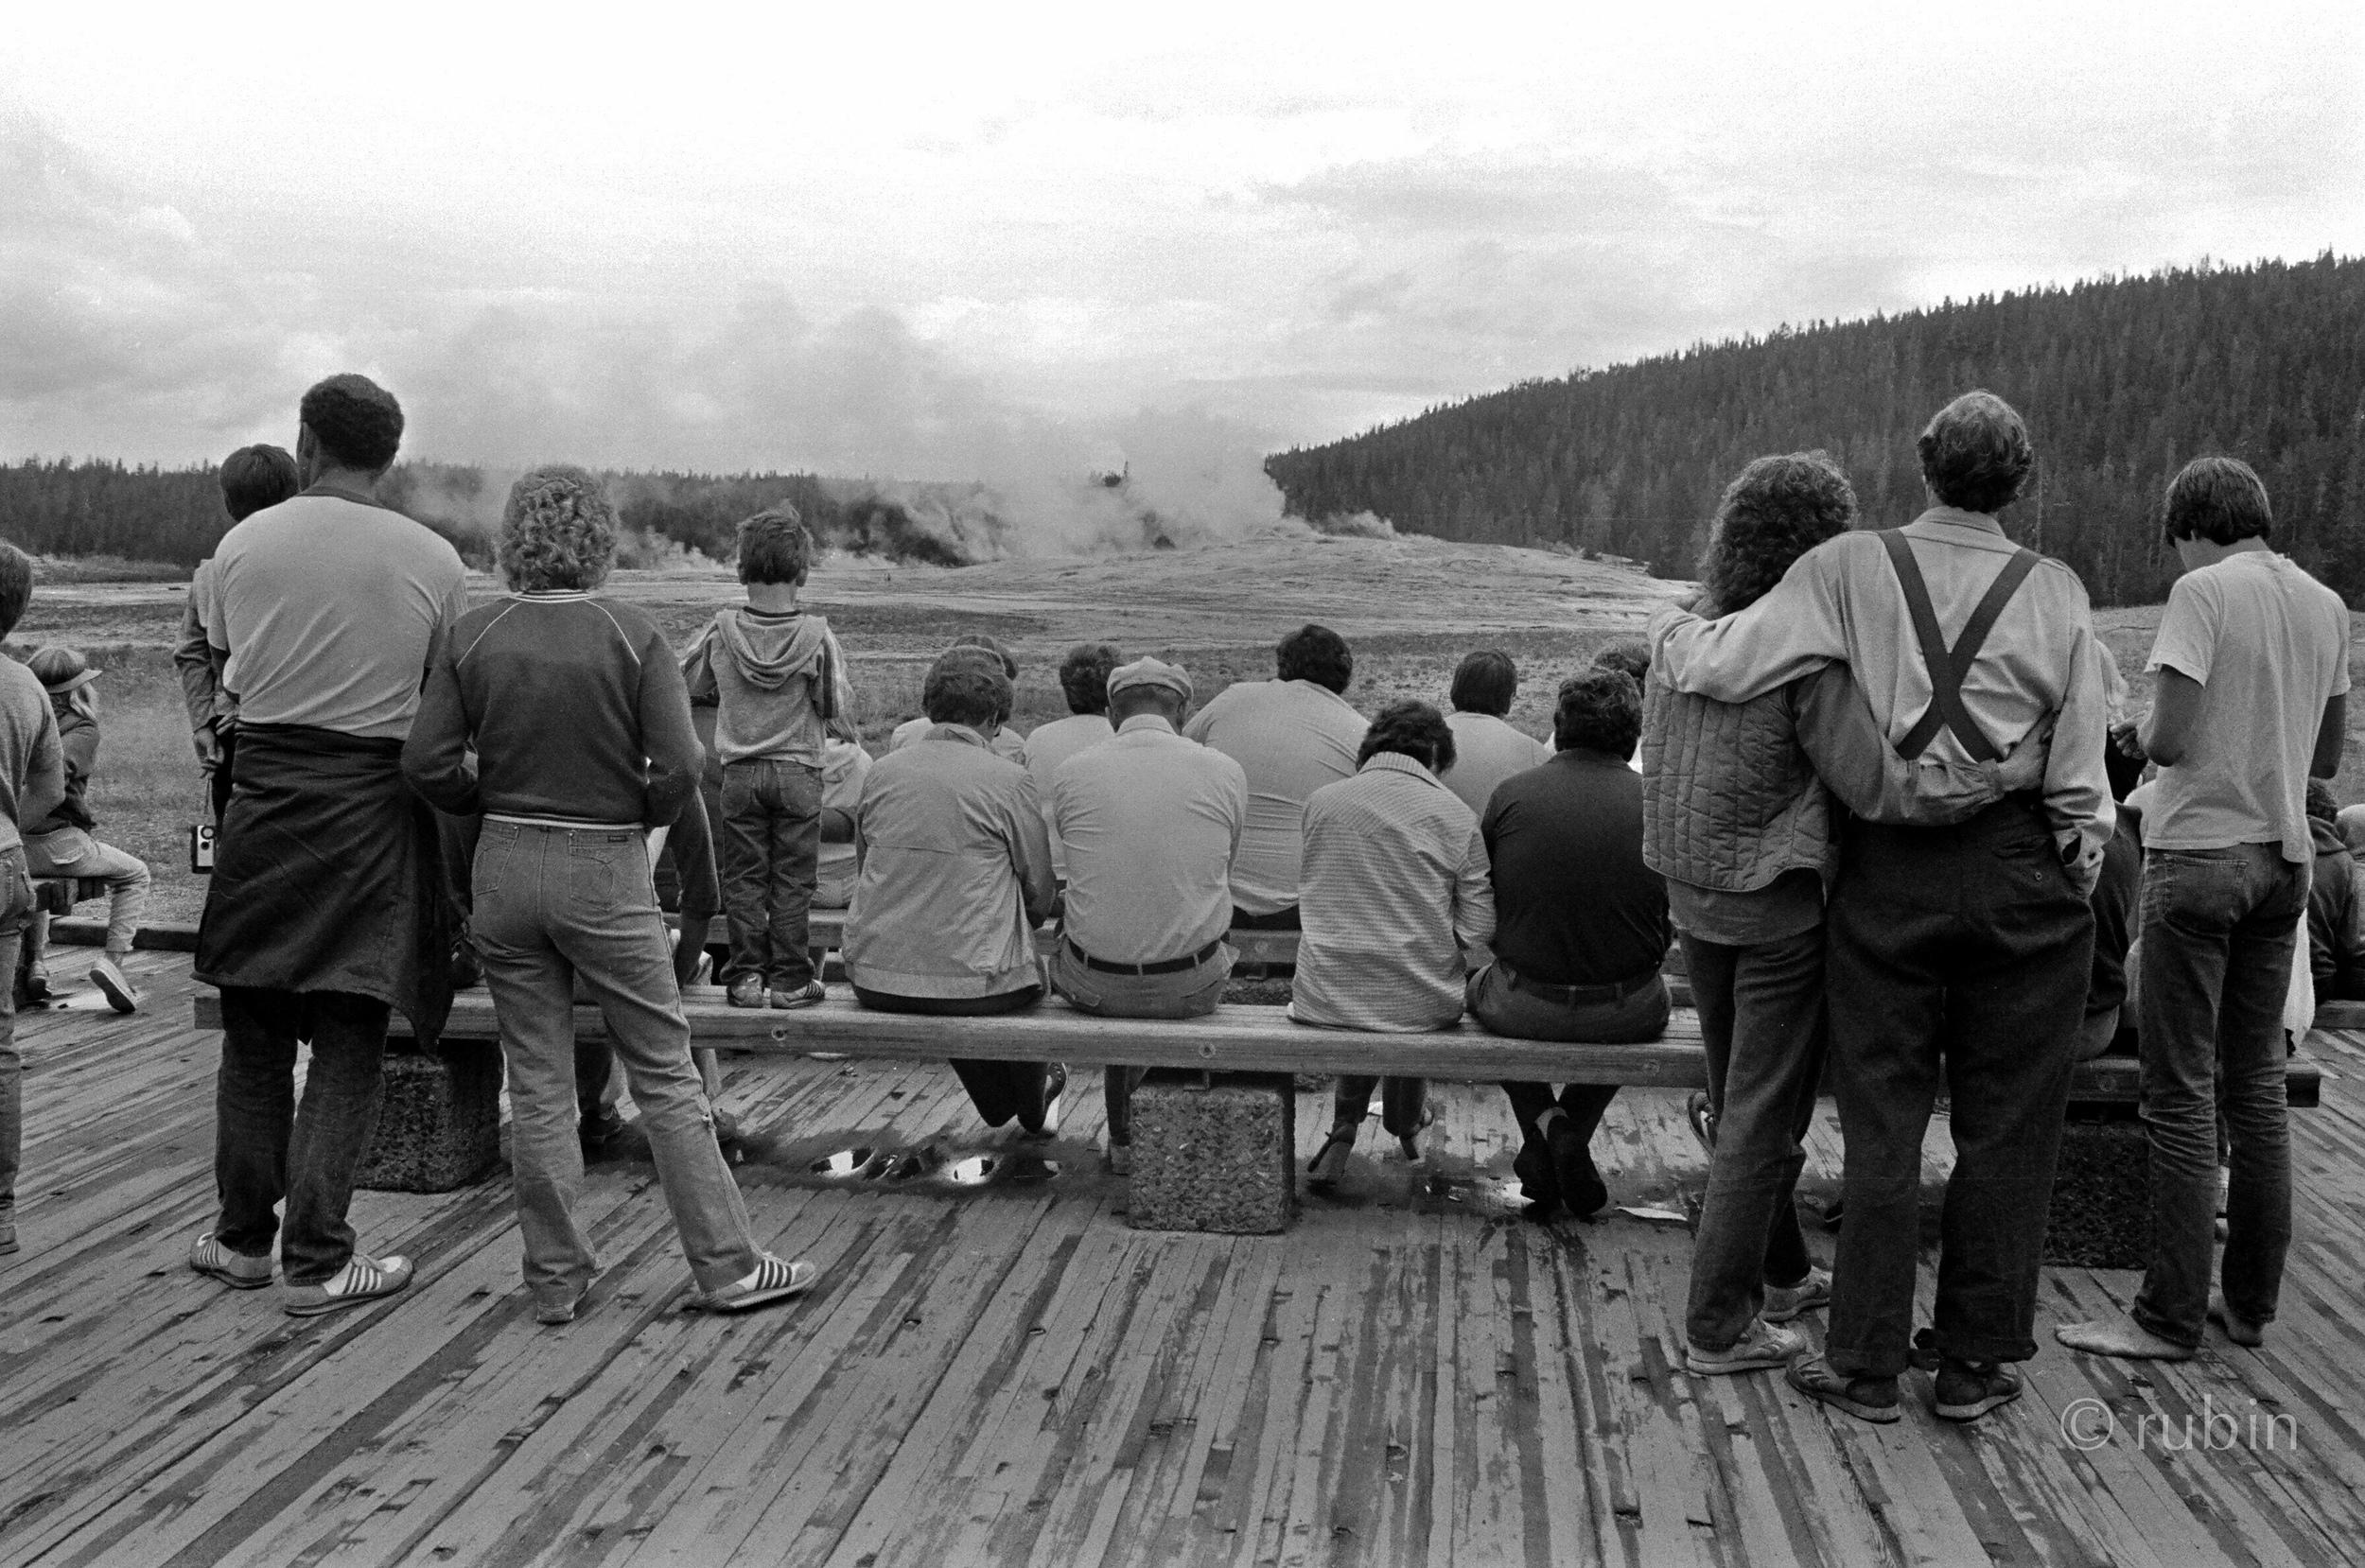 Waiting for Old Faithful, Yellowstone National Park